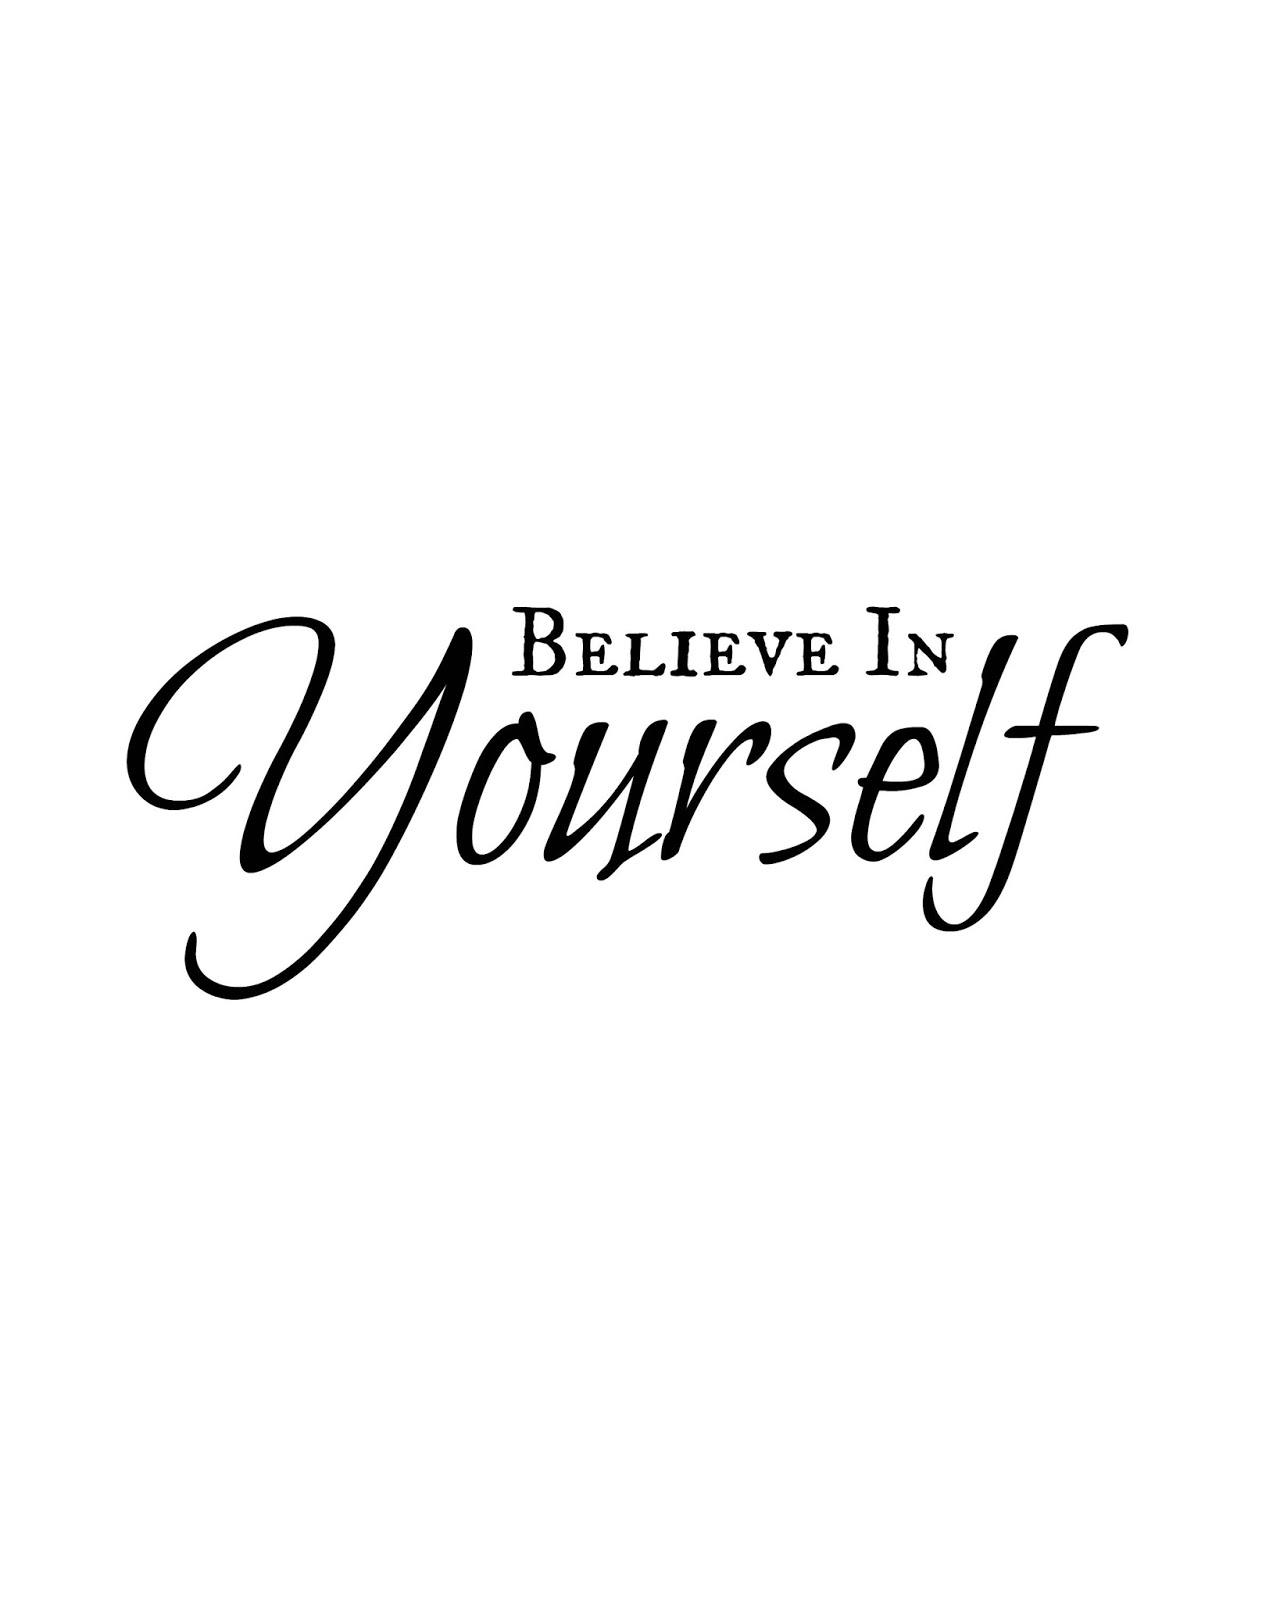 photo regarding Printable Word Art called CJO Image: Printable Term Artwork 8x10: Believe that in just Your self